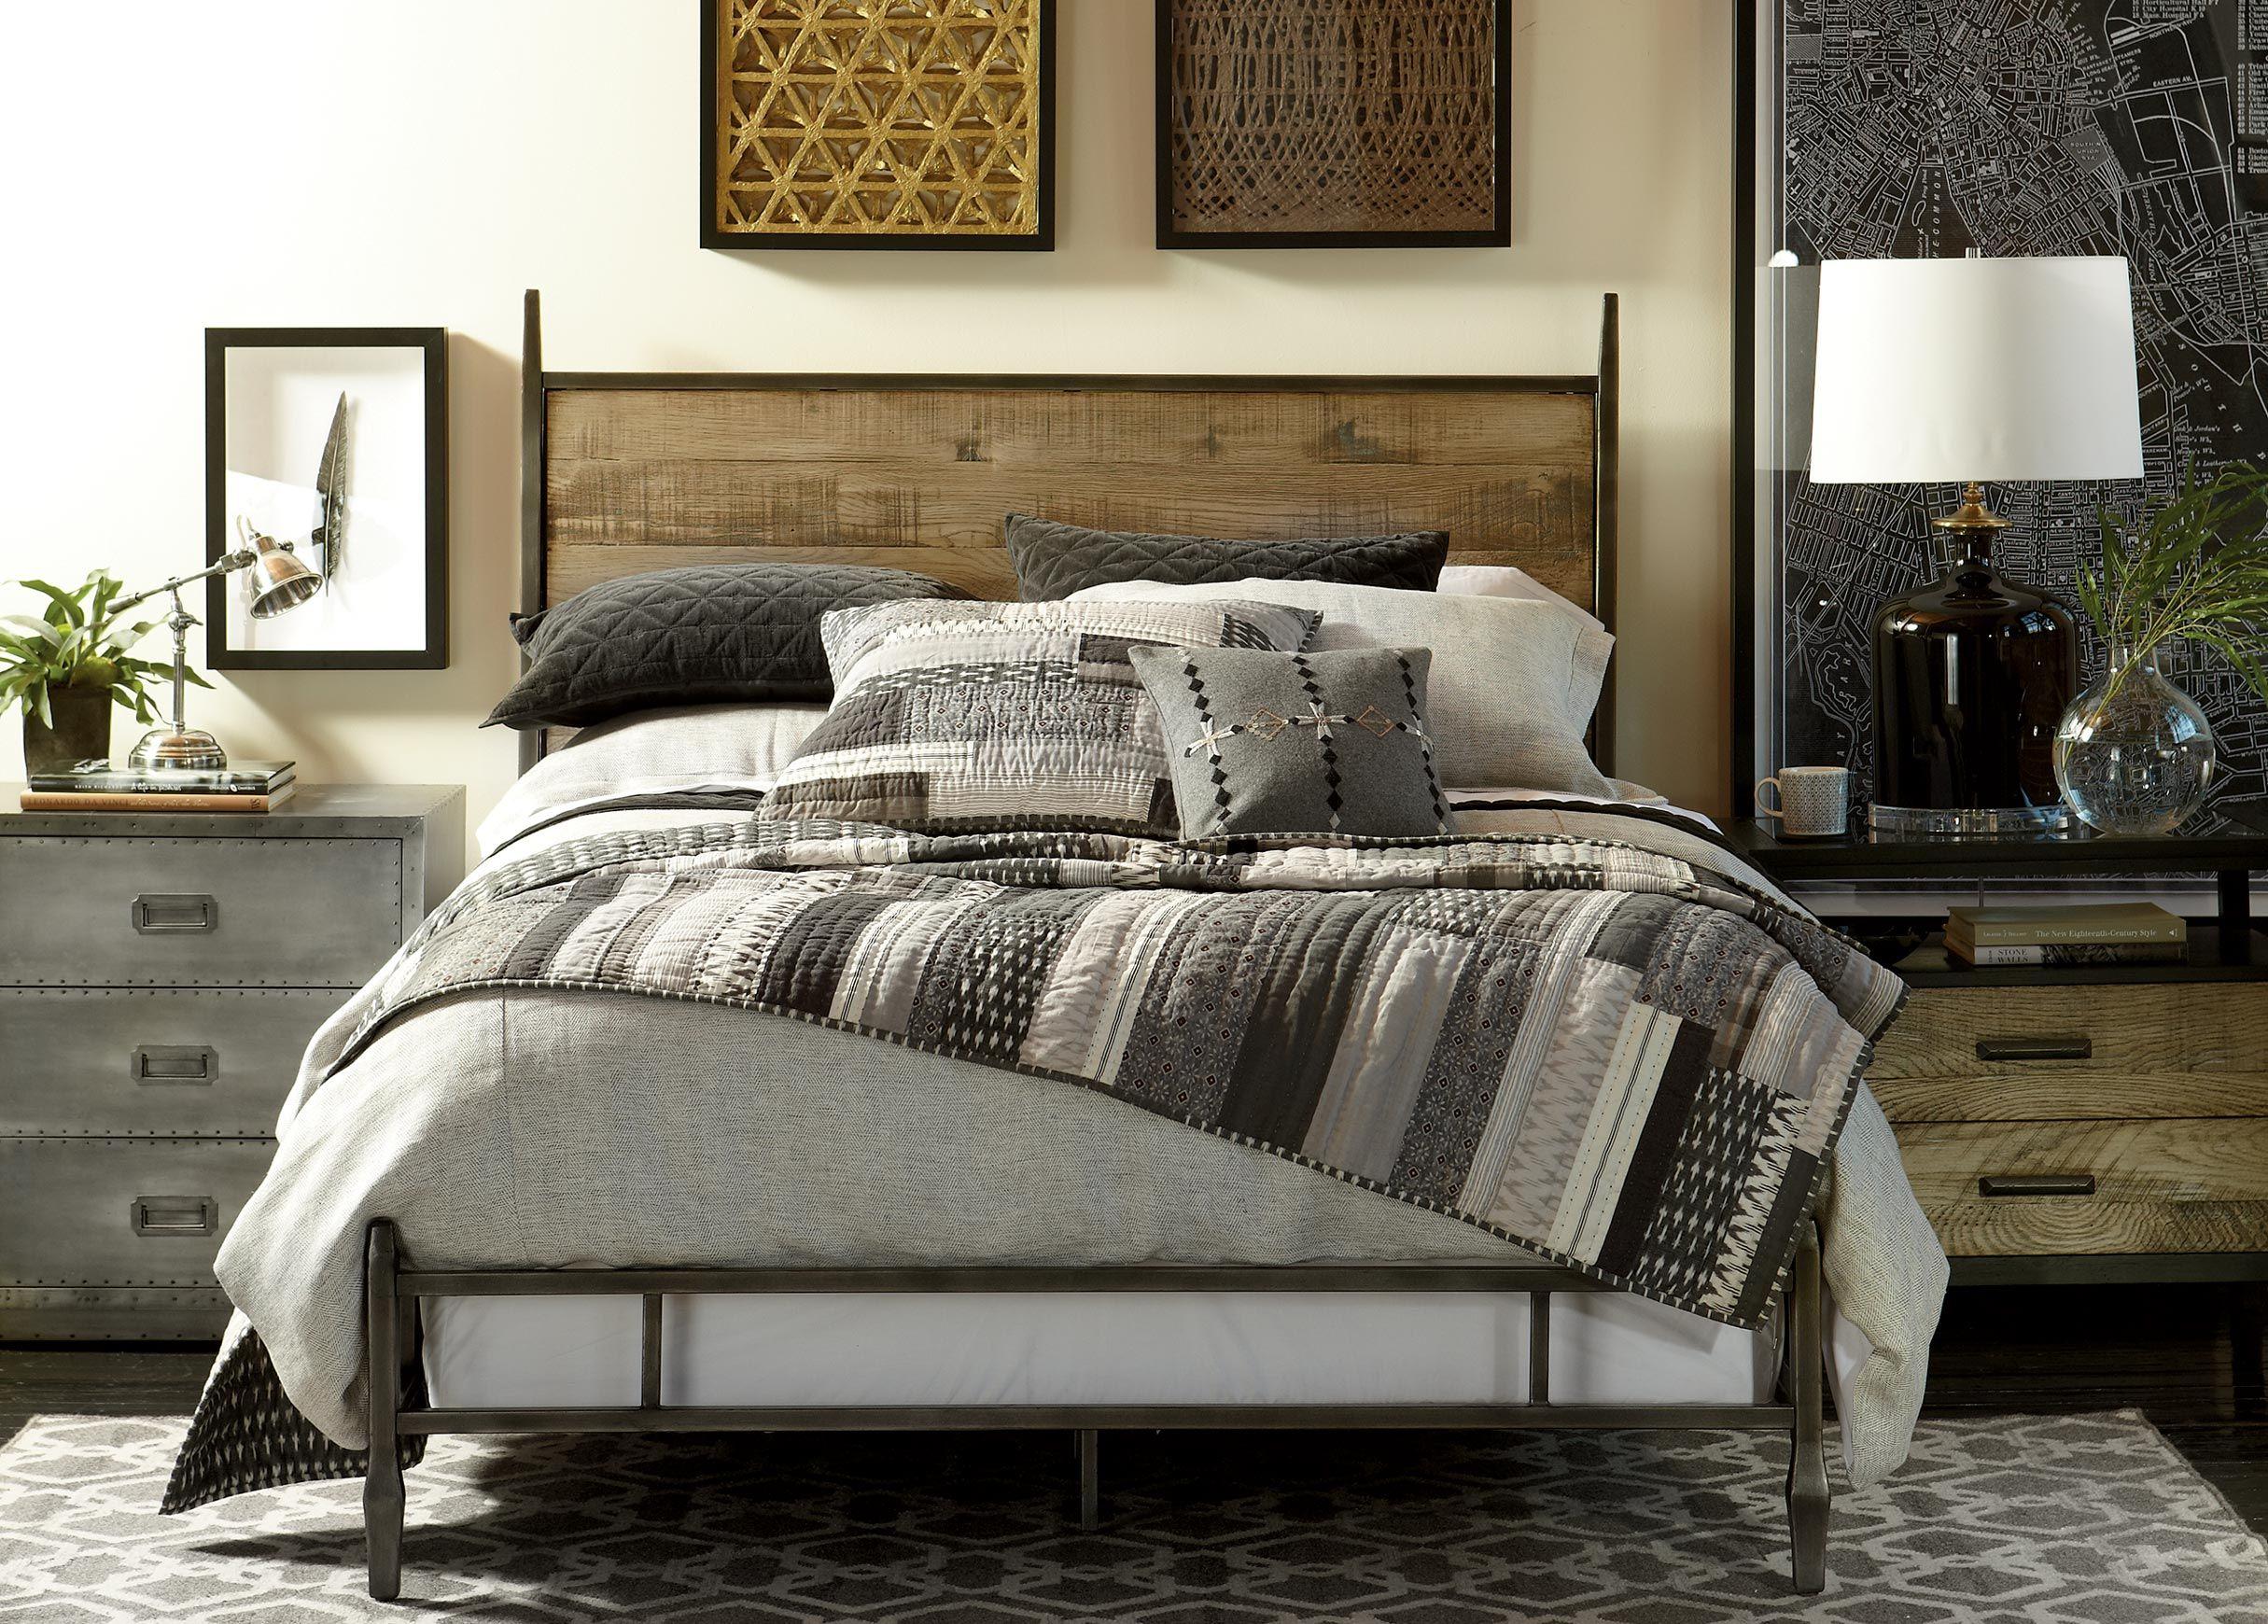 Kennan Quilt Ethan Allen US Furniture, Queen size bed